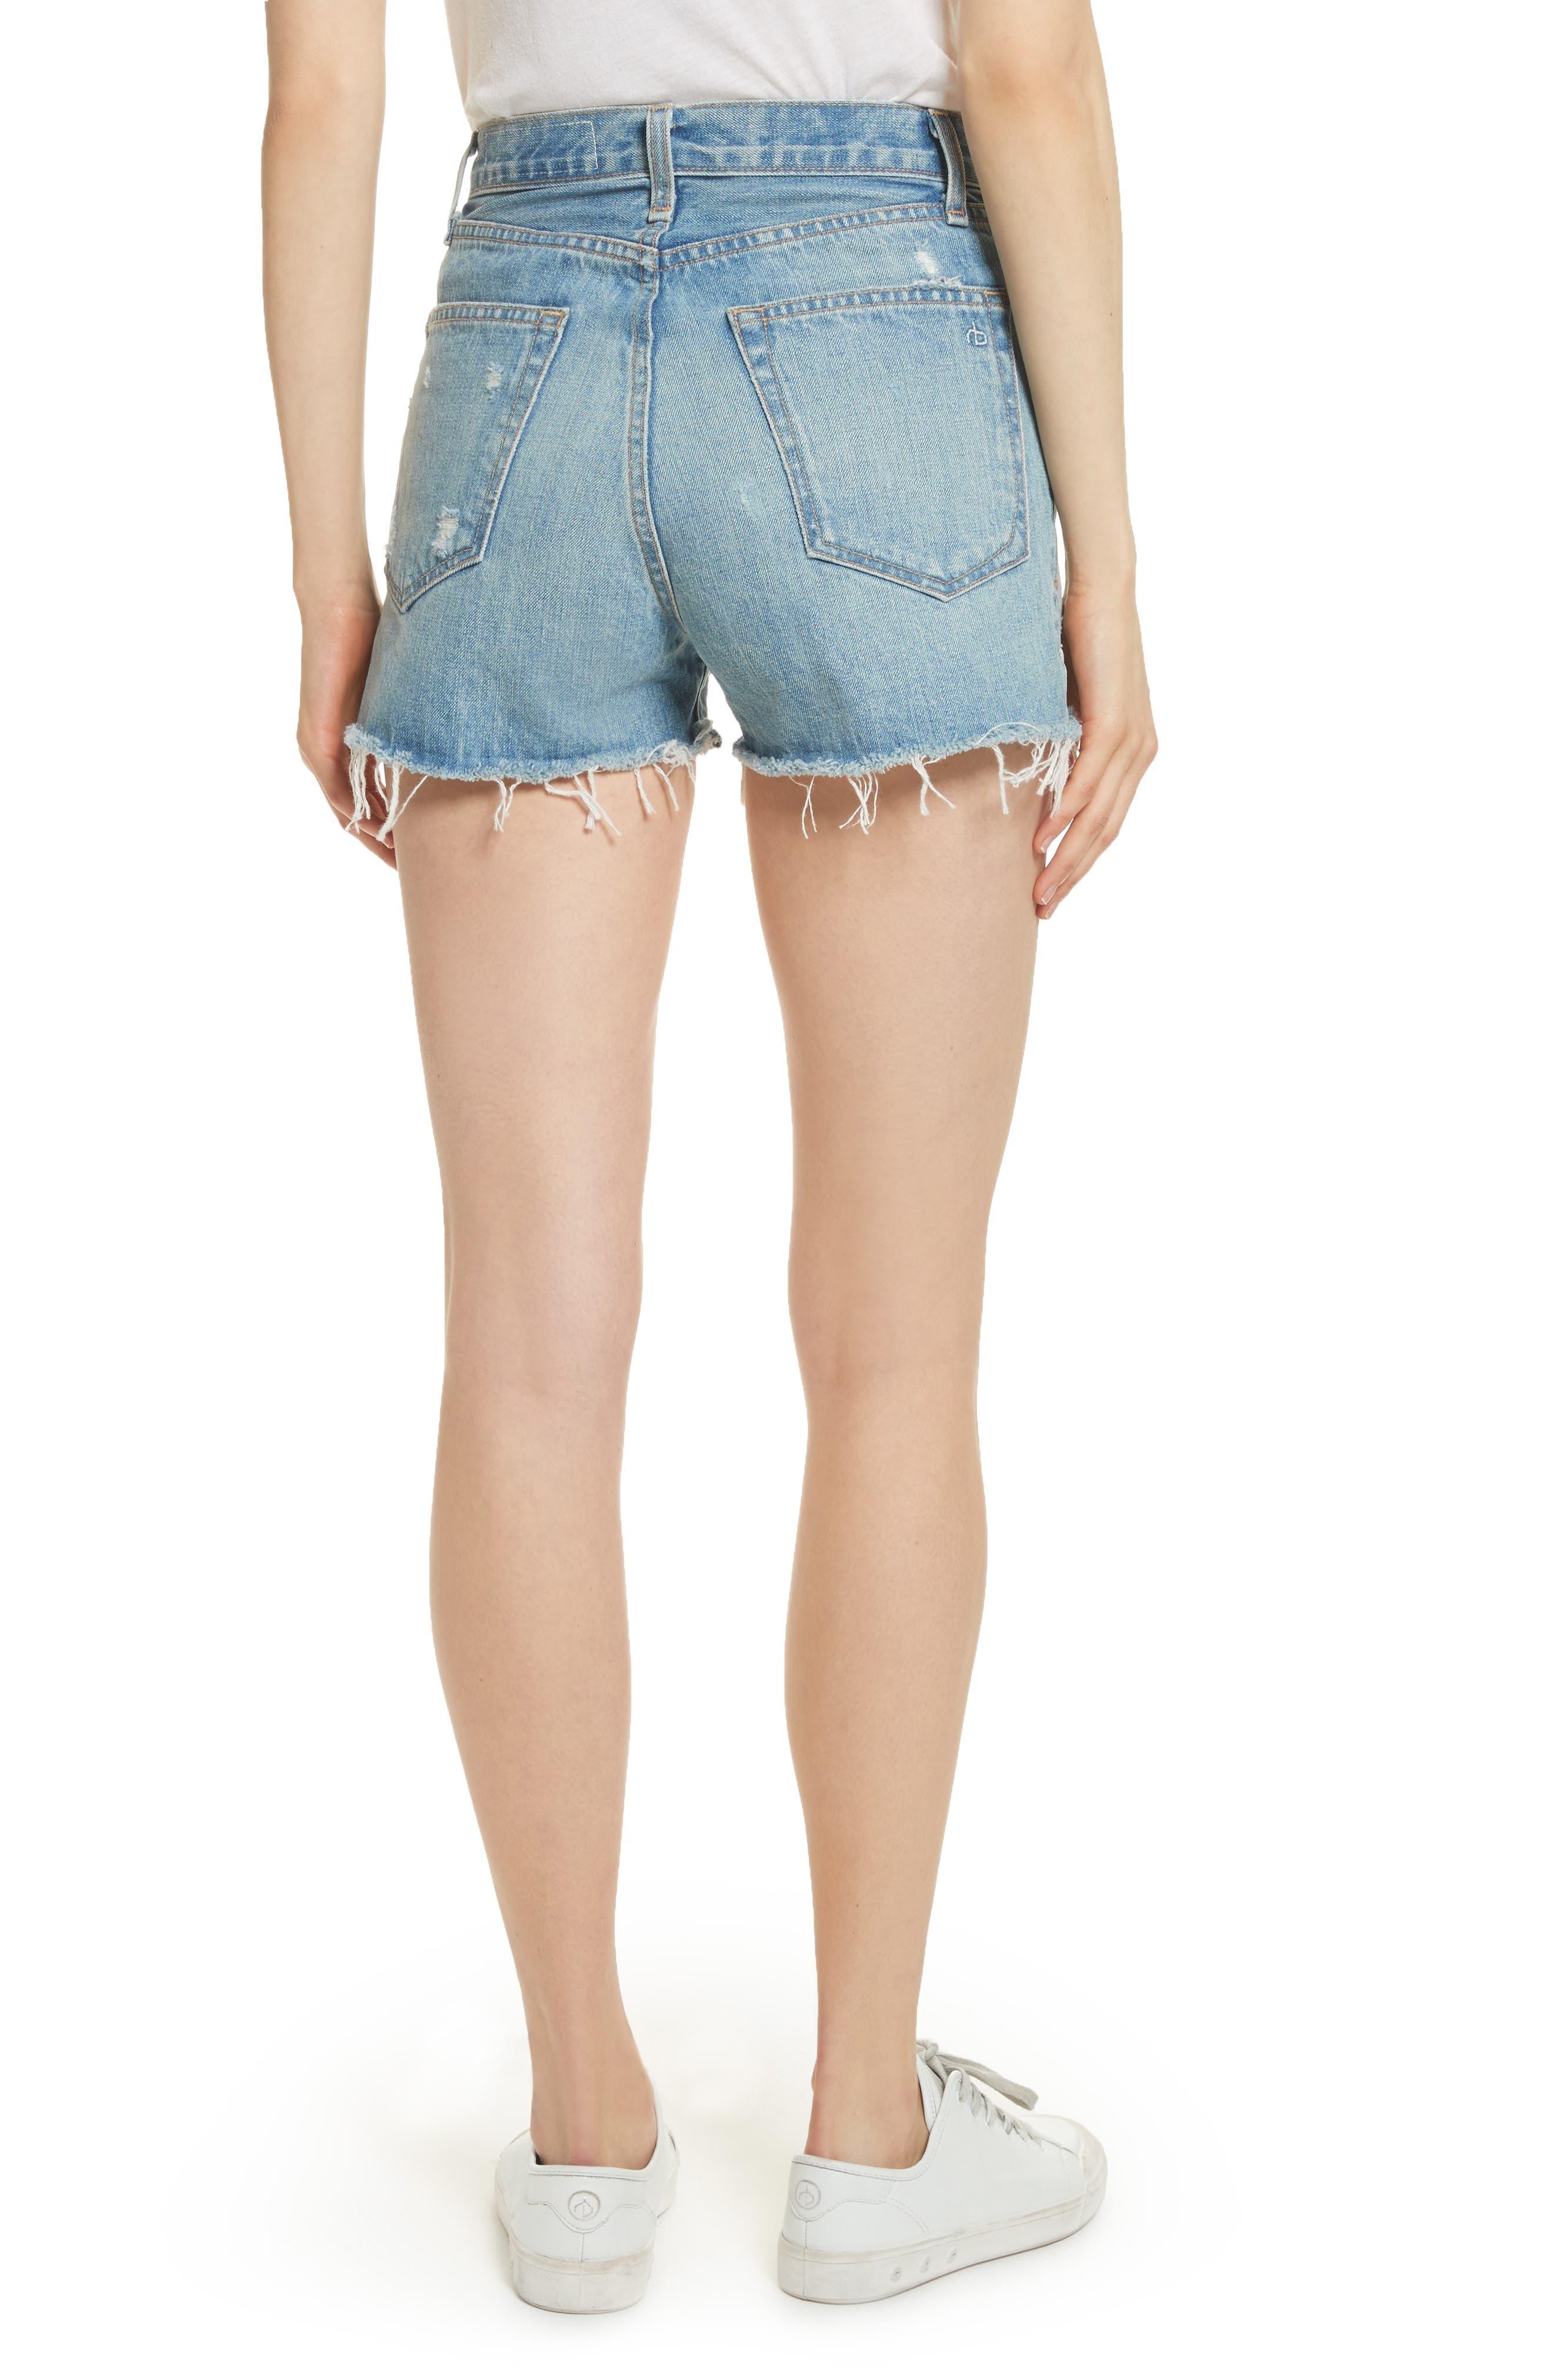 Alternate Image 2  - rag & bone/JEAN Justine High Waist Cutoff Denim Shorts (Duffs)